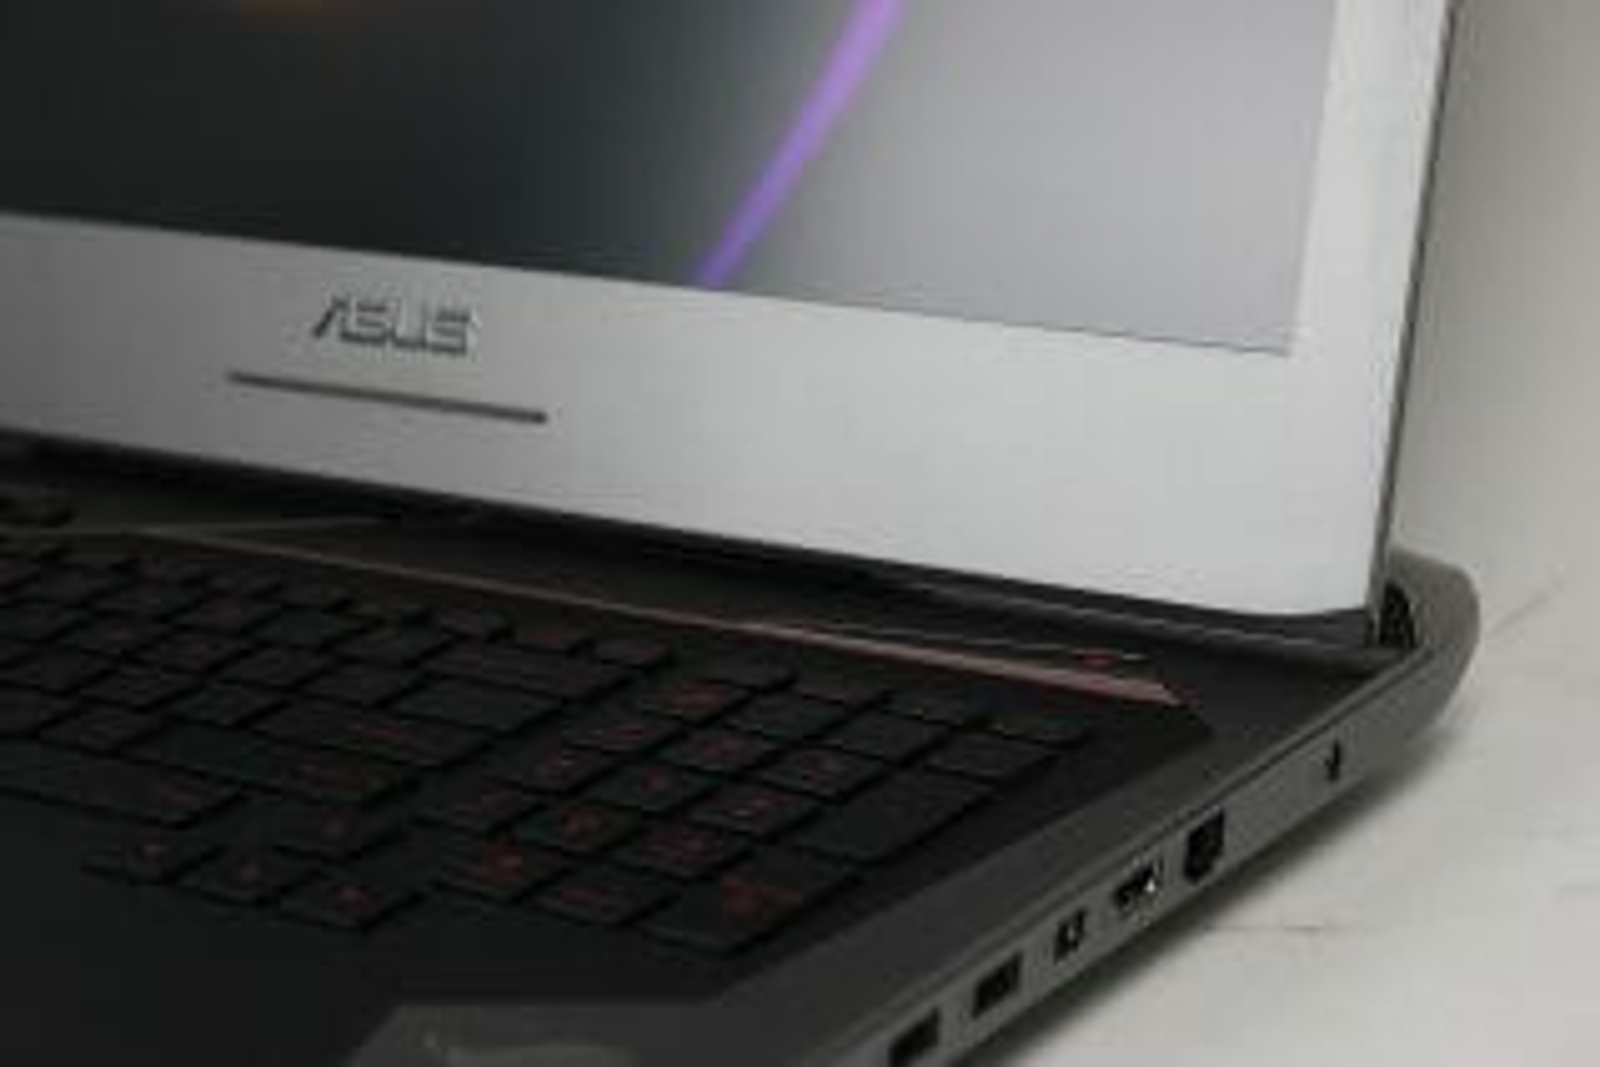 Asus Rog G752Vt-Dh72 (Laptop) Review 2